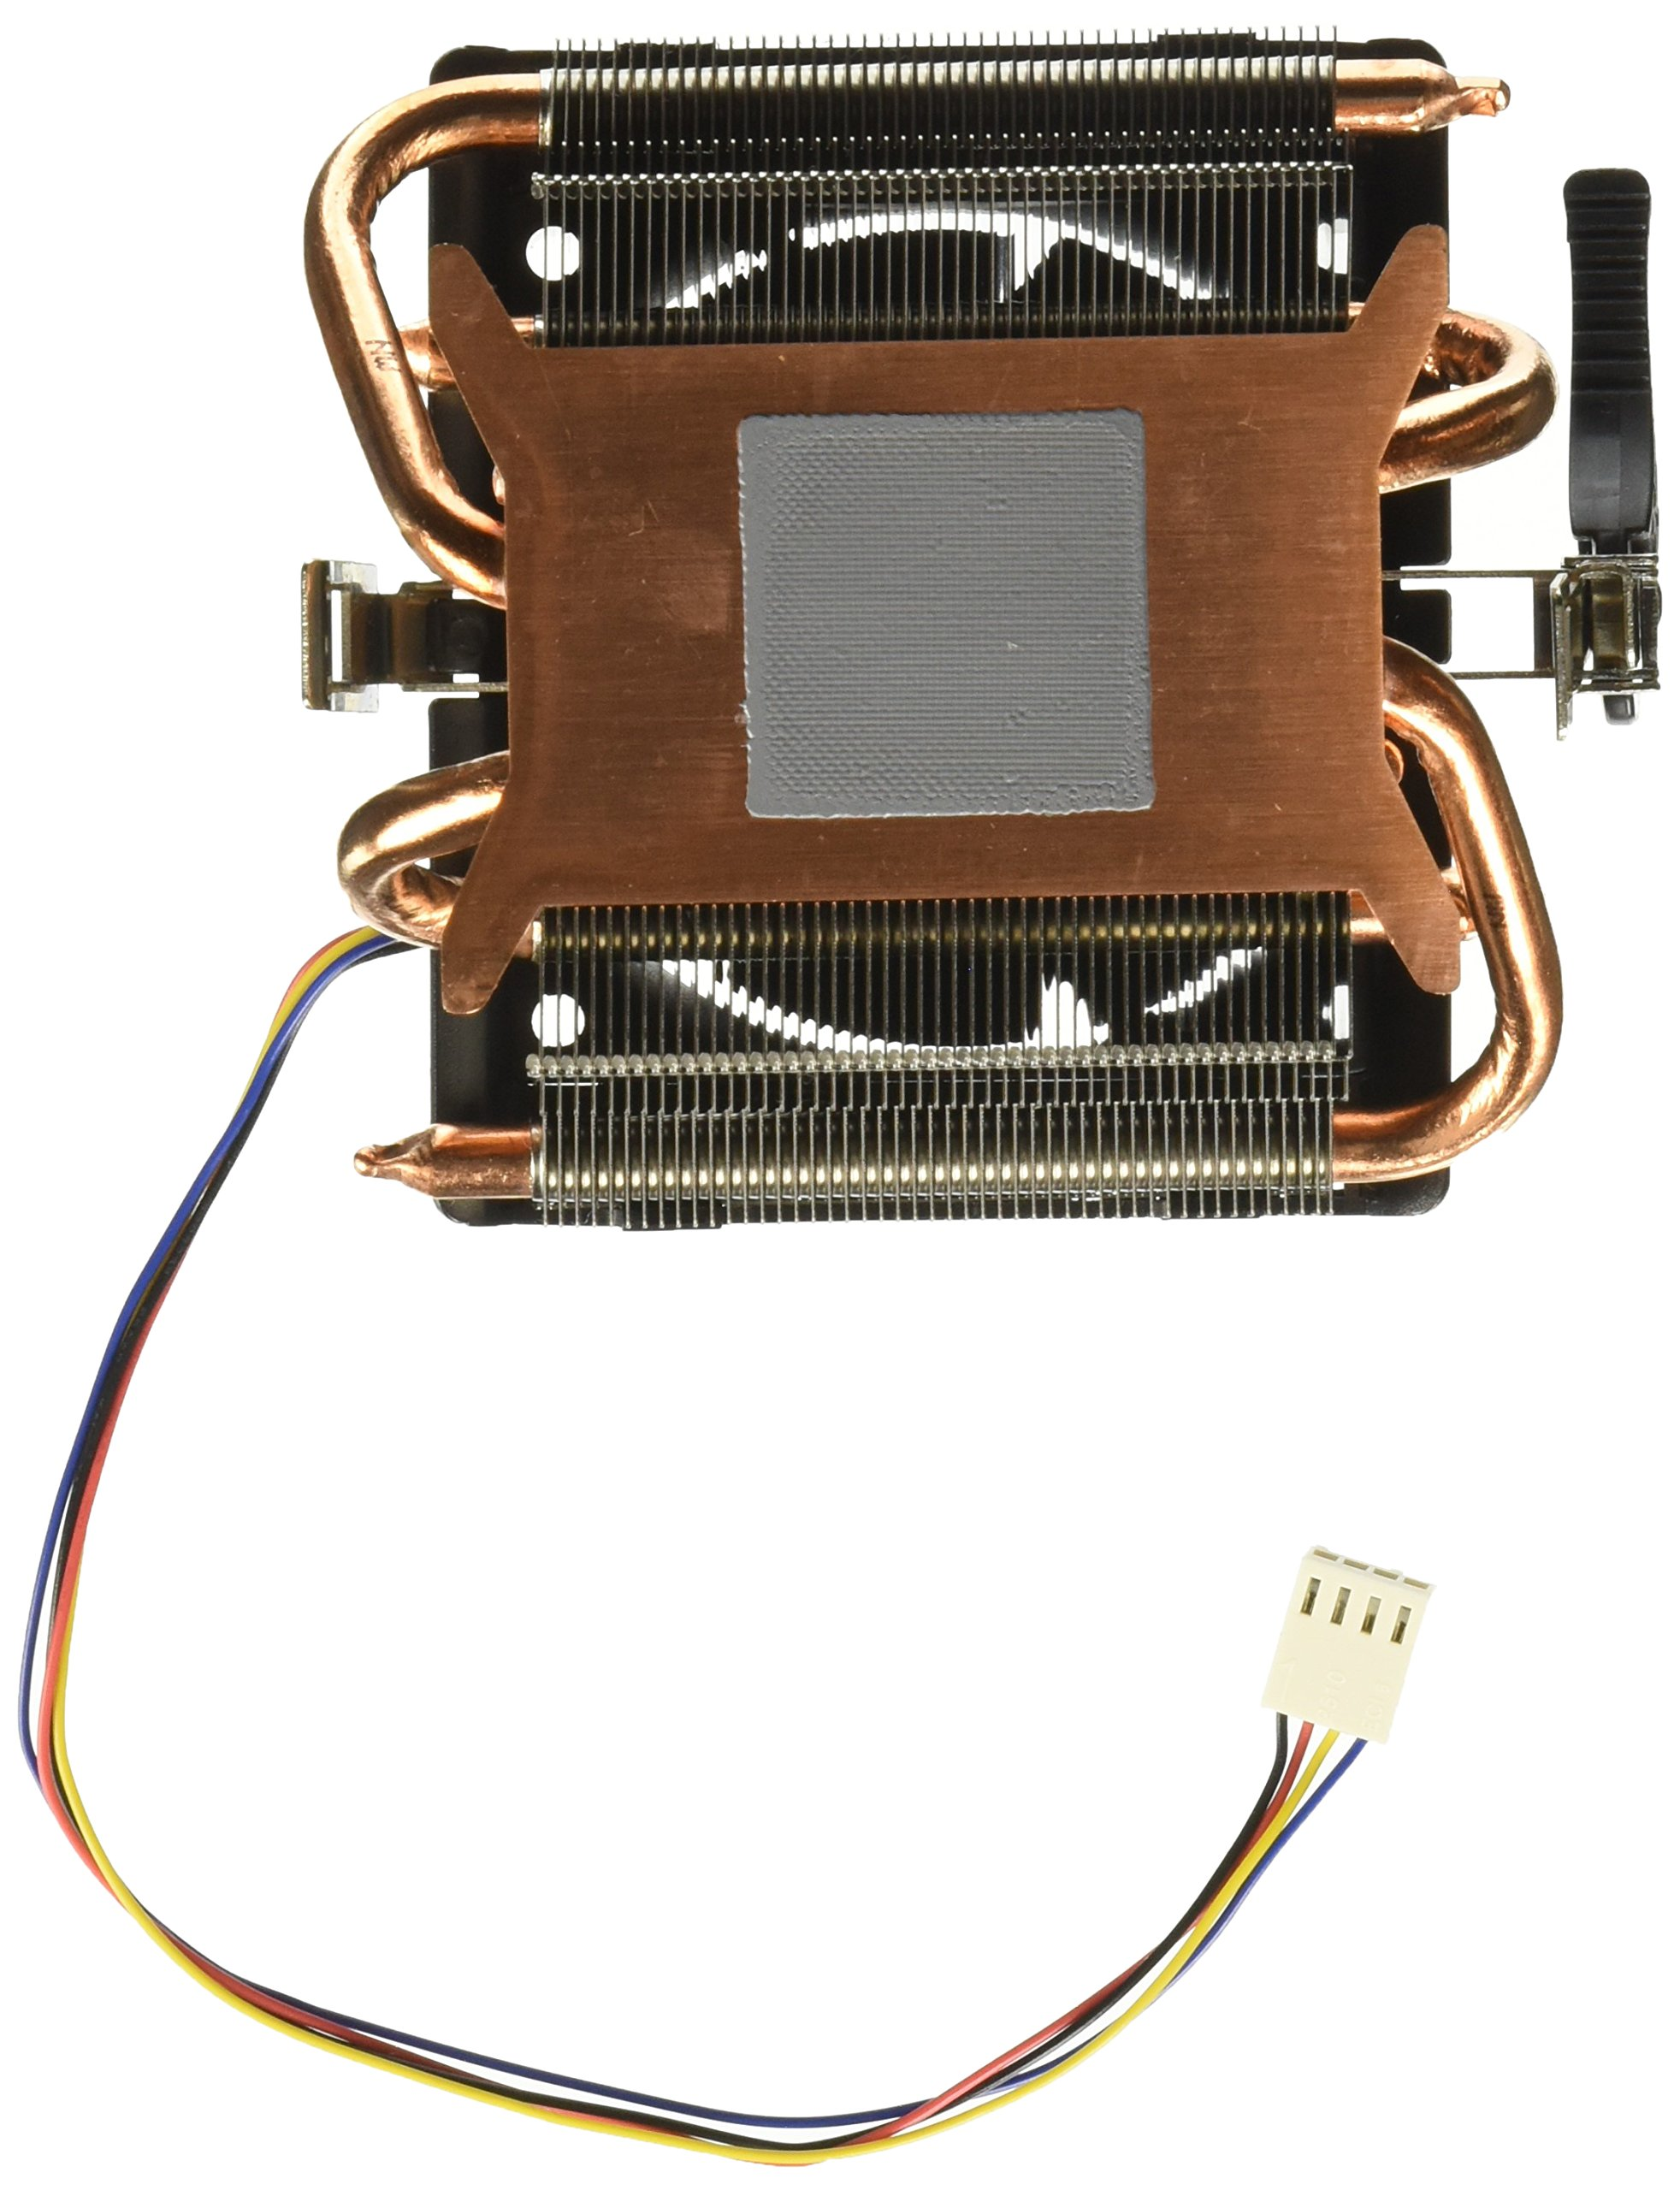 AMD FD8350FRHKBOX FX-8350  FX-Series 8-Core Black Edition Processor by AMD (Image #1)